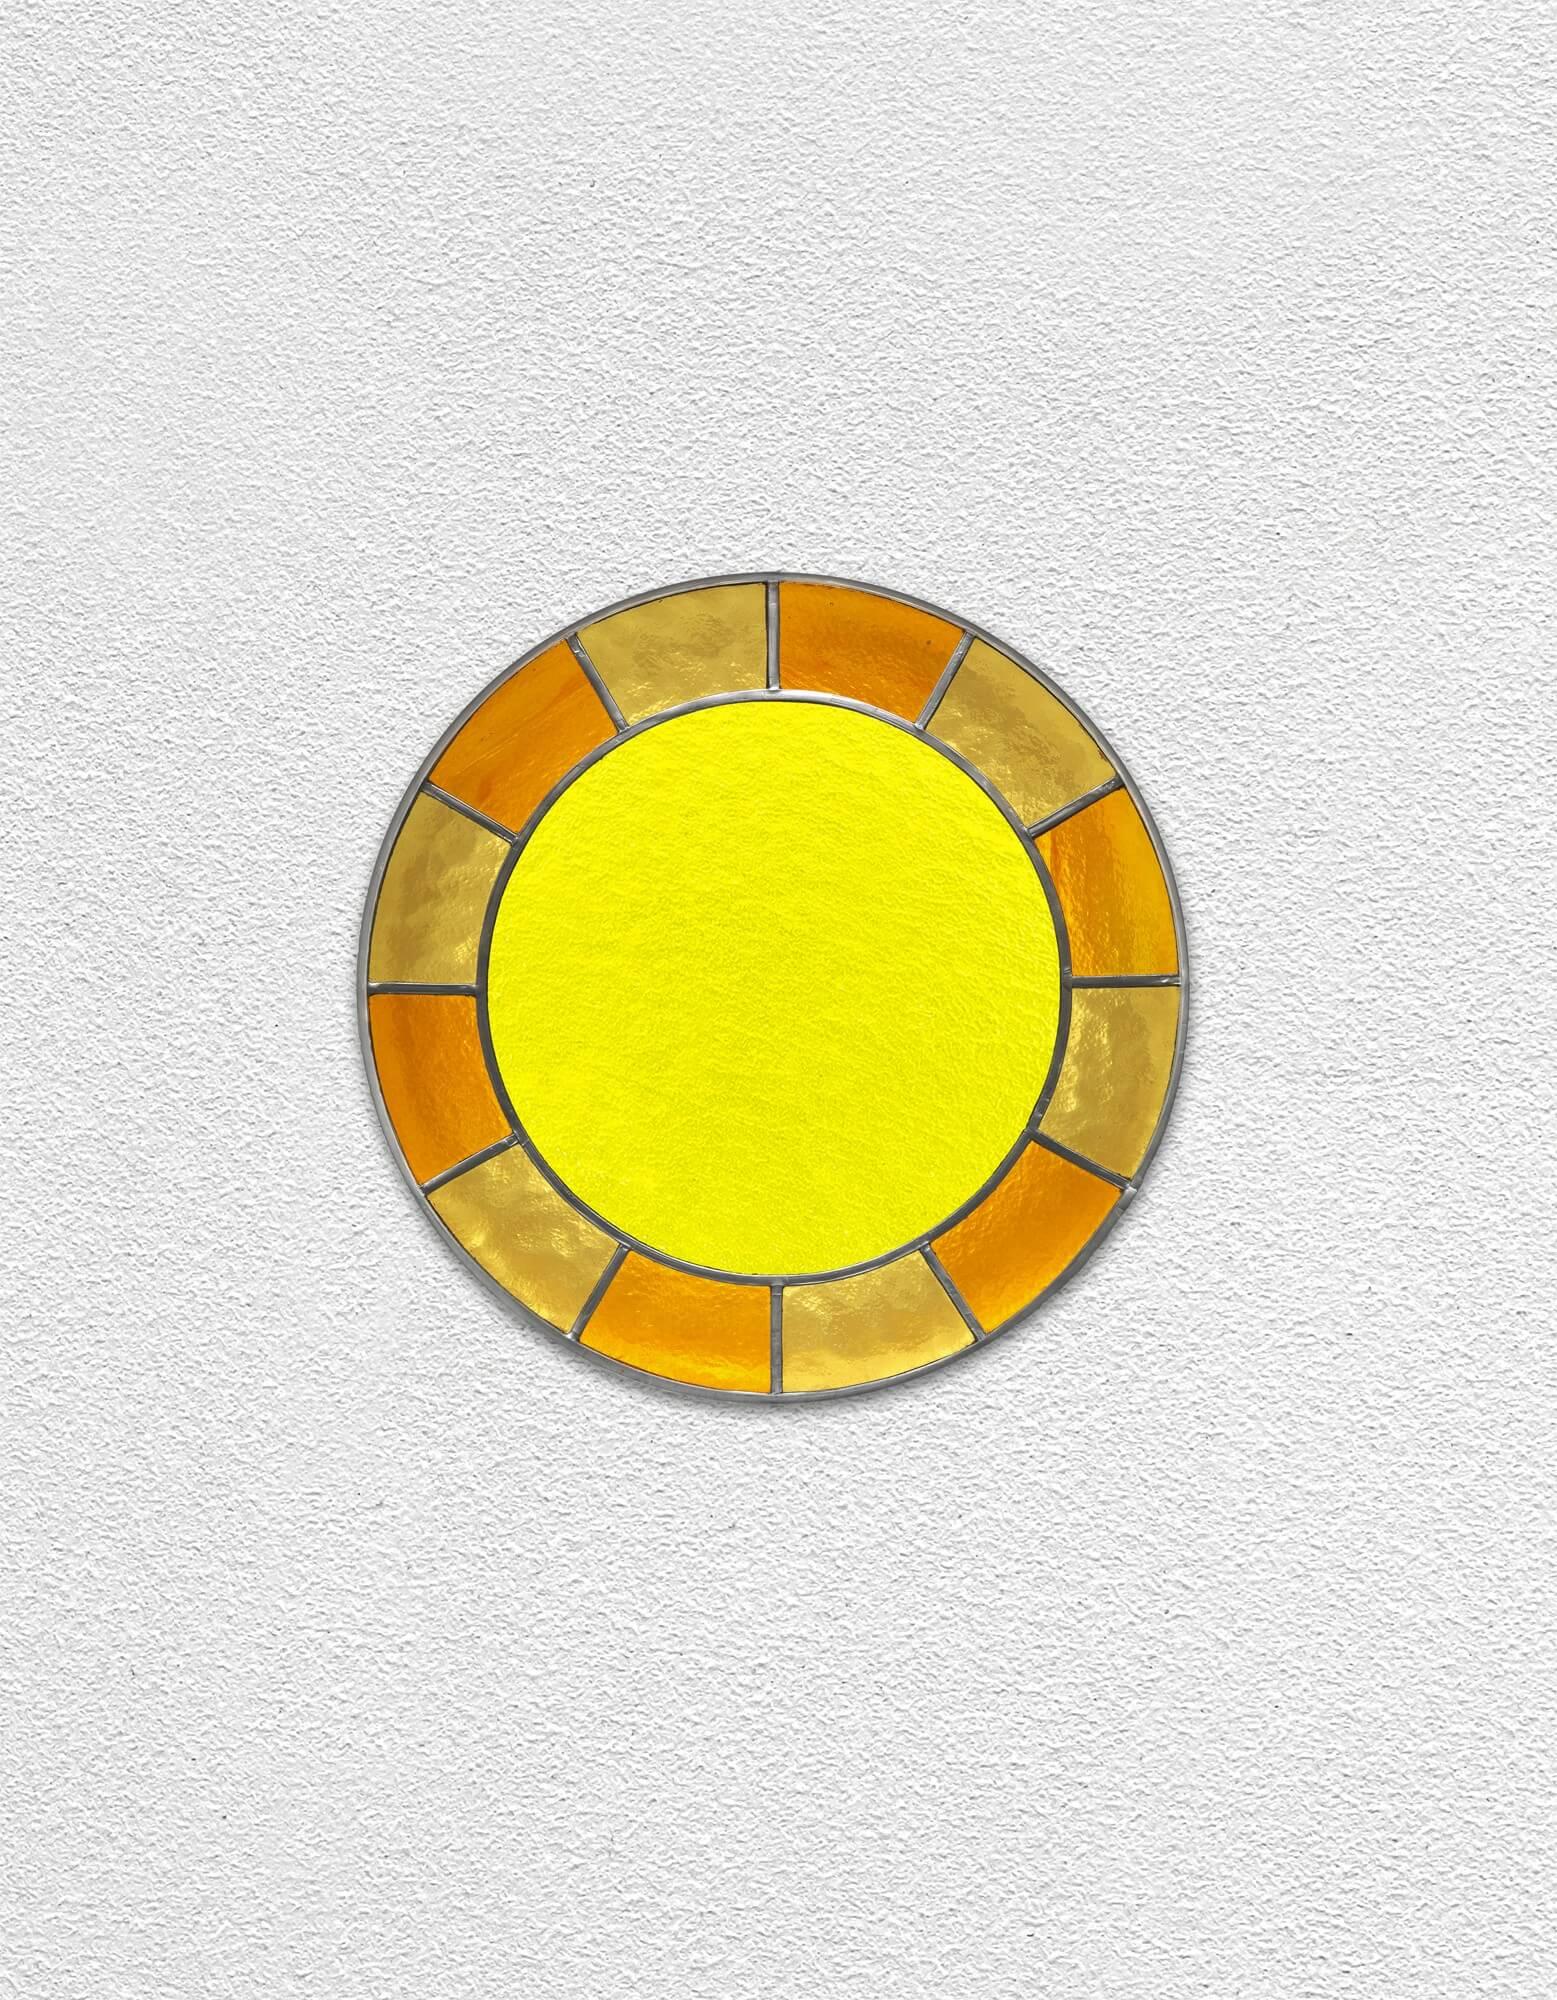 orange orange yellow clock | UGO RONDINONE